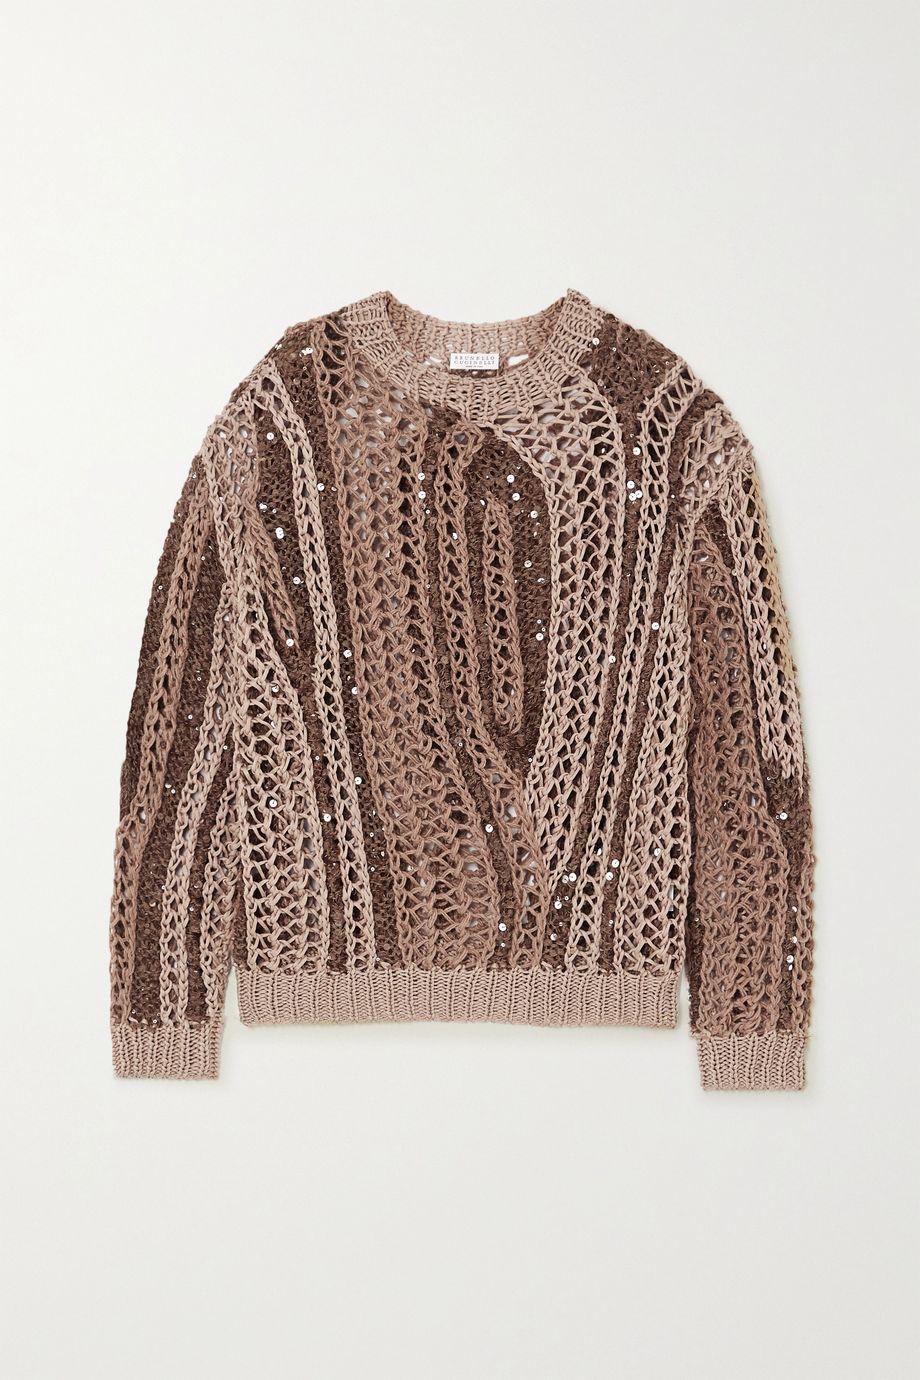 Brunello Cucinelli Opera sequin-embellished open-knit cotton-blend sweater